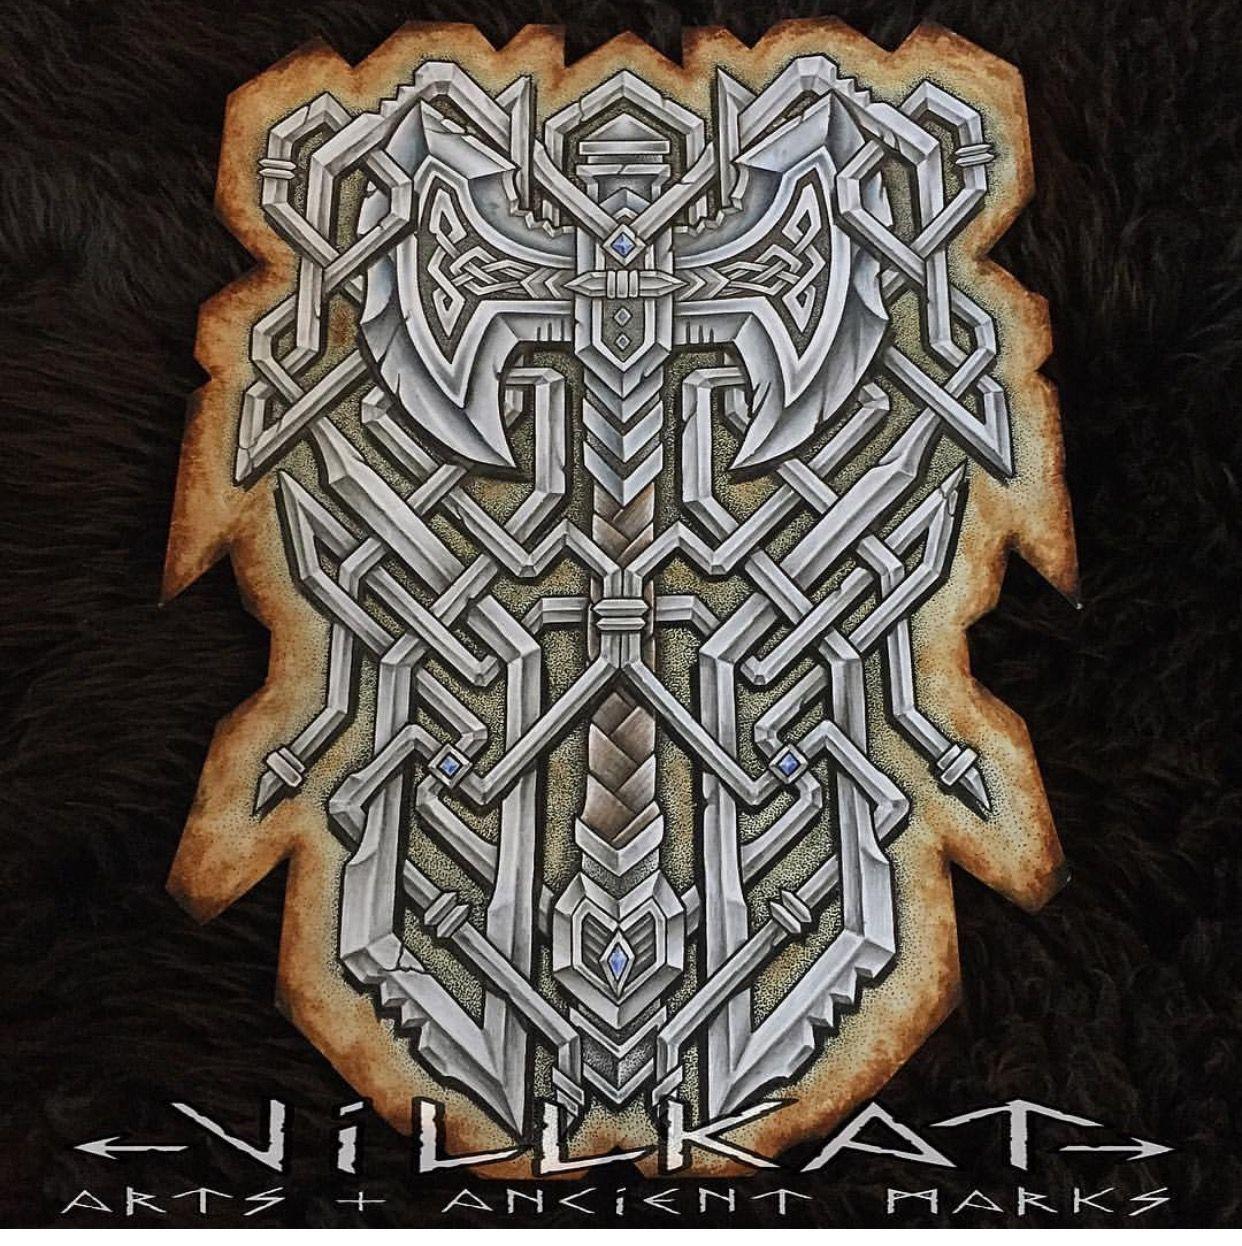 pingl par patrick lain sur sirmorgan pinterest viking tattoos tattoos et norse tattoo. Black Bedroom Furniture Sets. Home Design Ideas